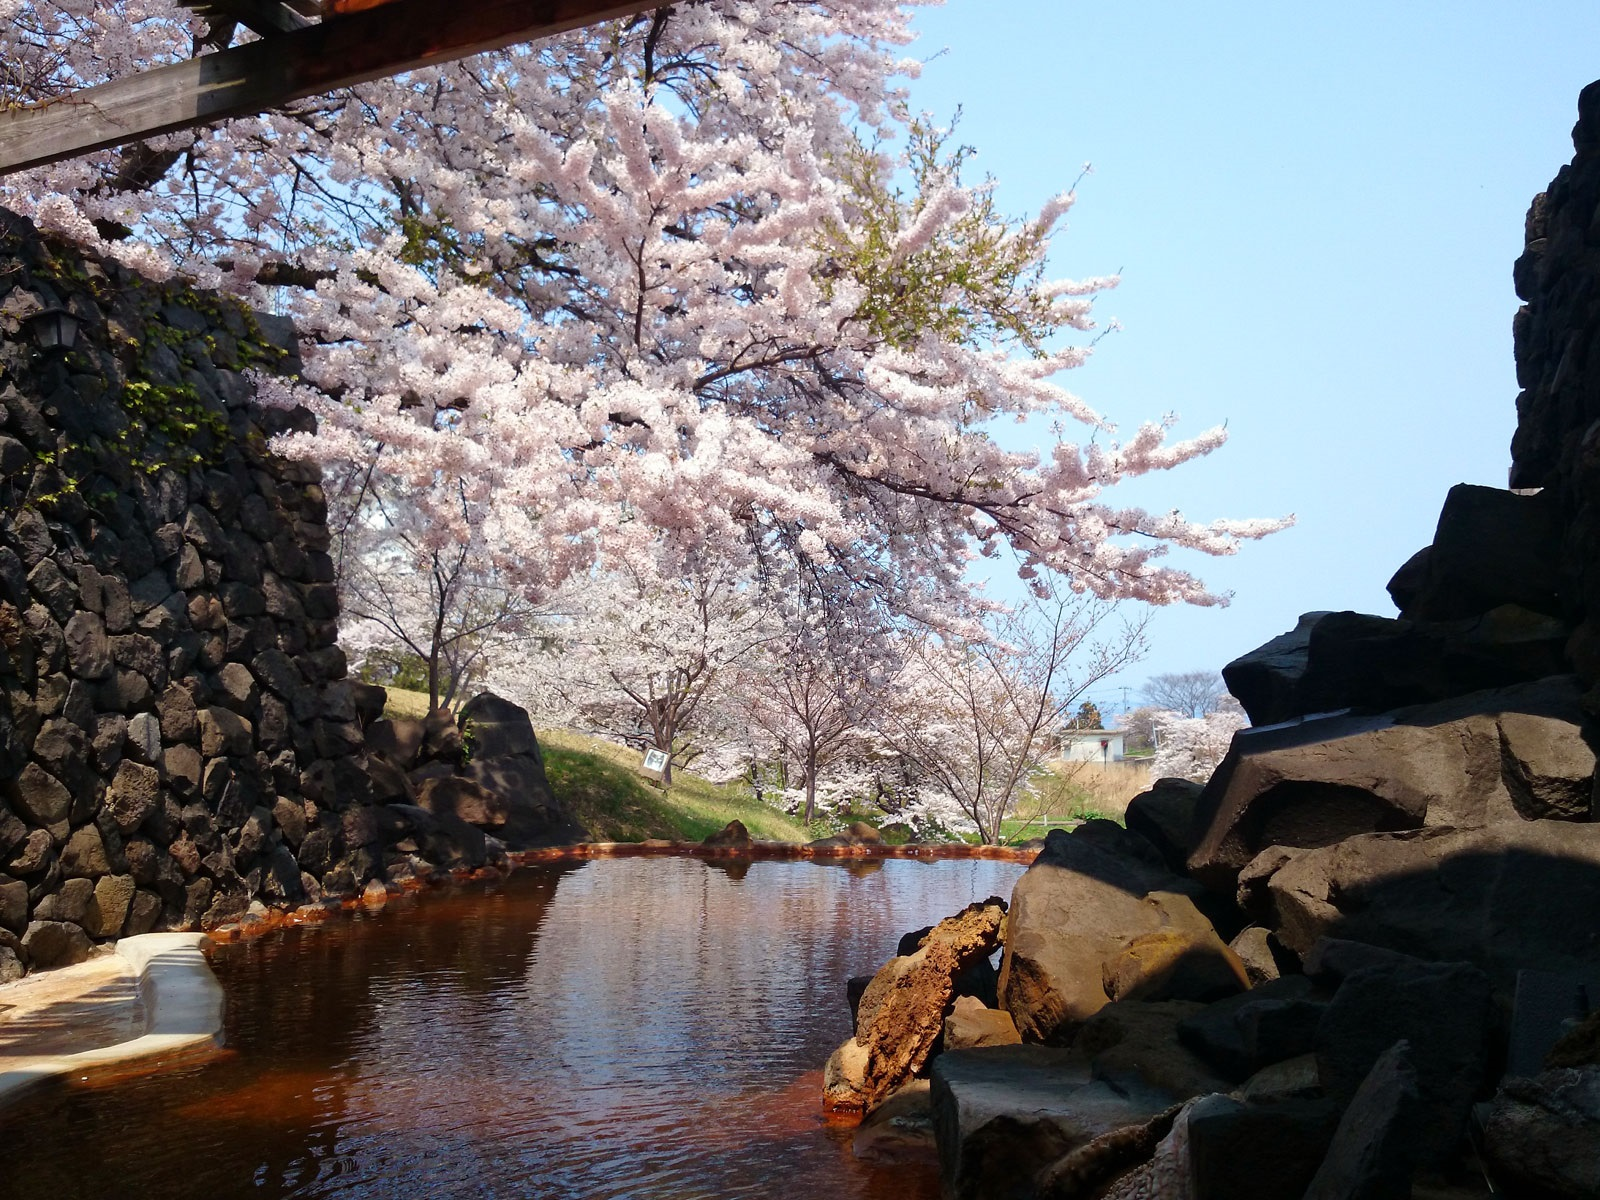 秋田県男鹿半島・男鹿温泉郷 男鹿ホテルの花見露天風呂